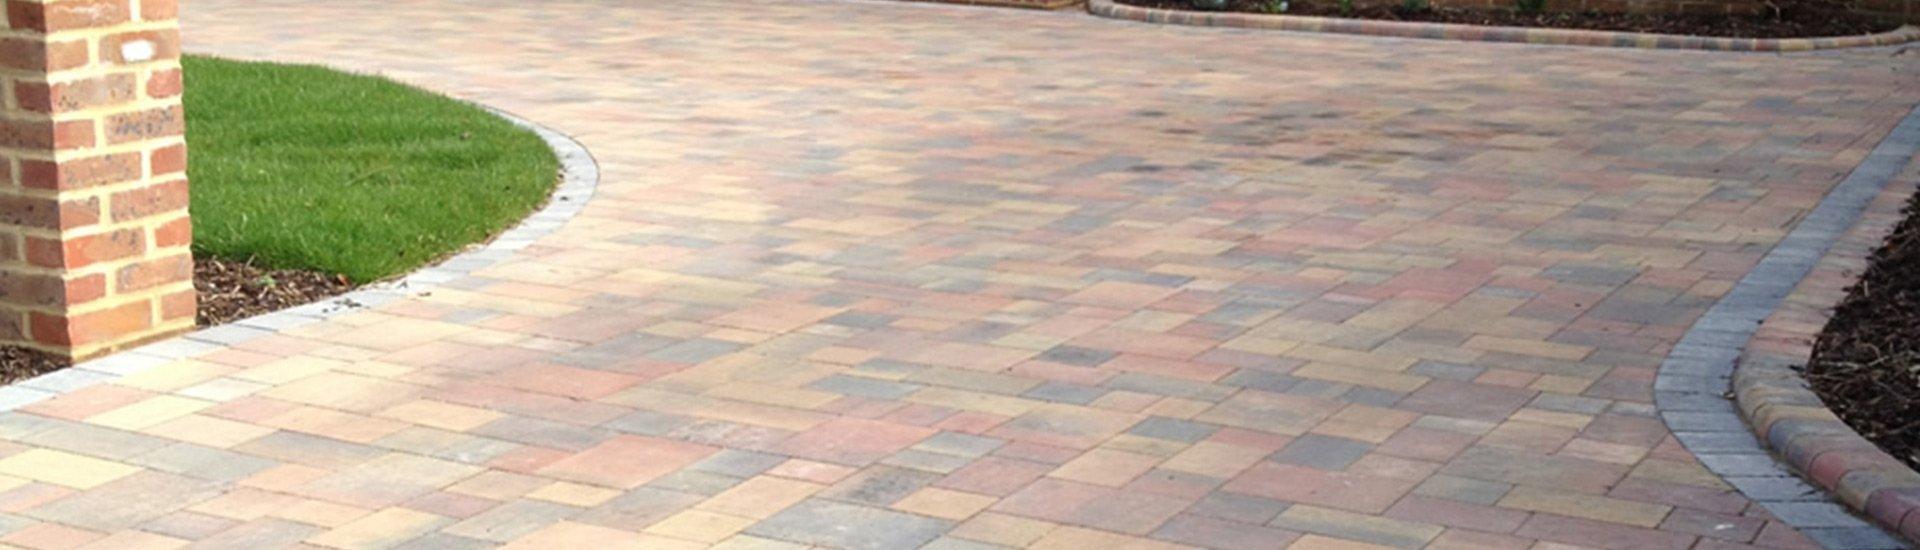 coloured tiles laid